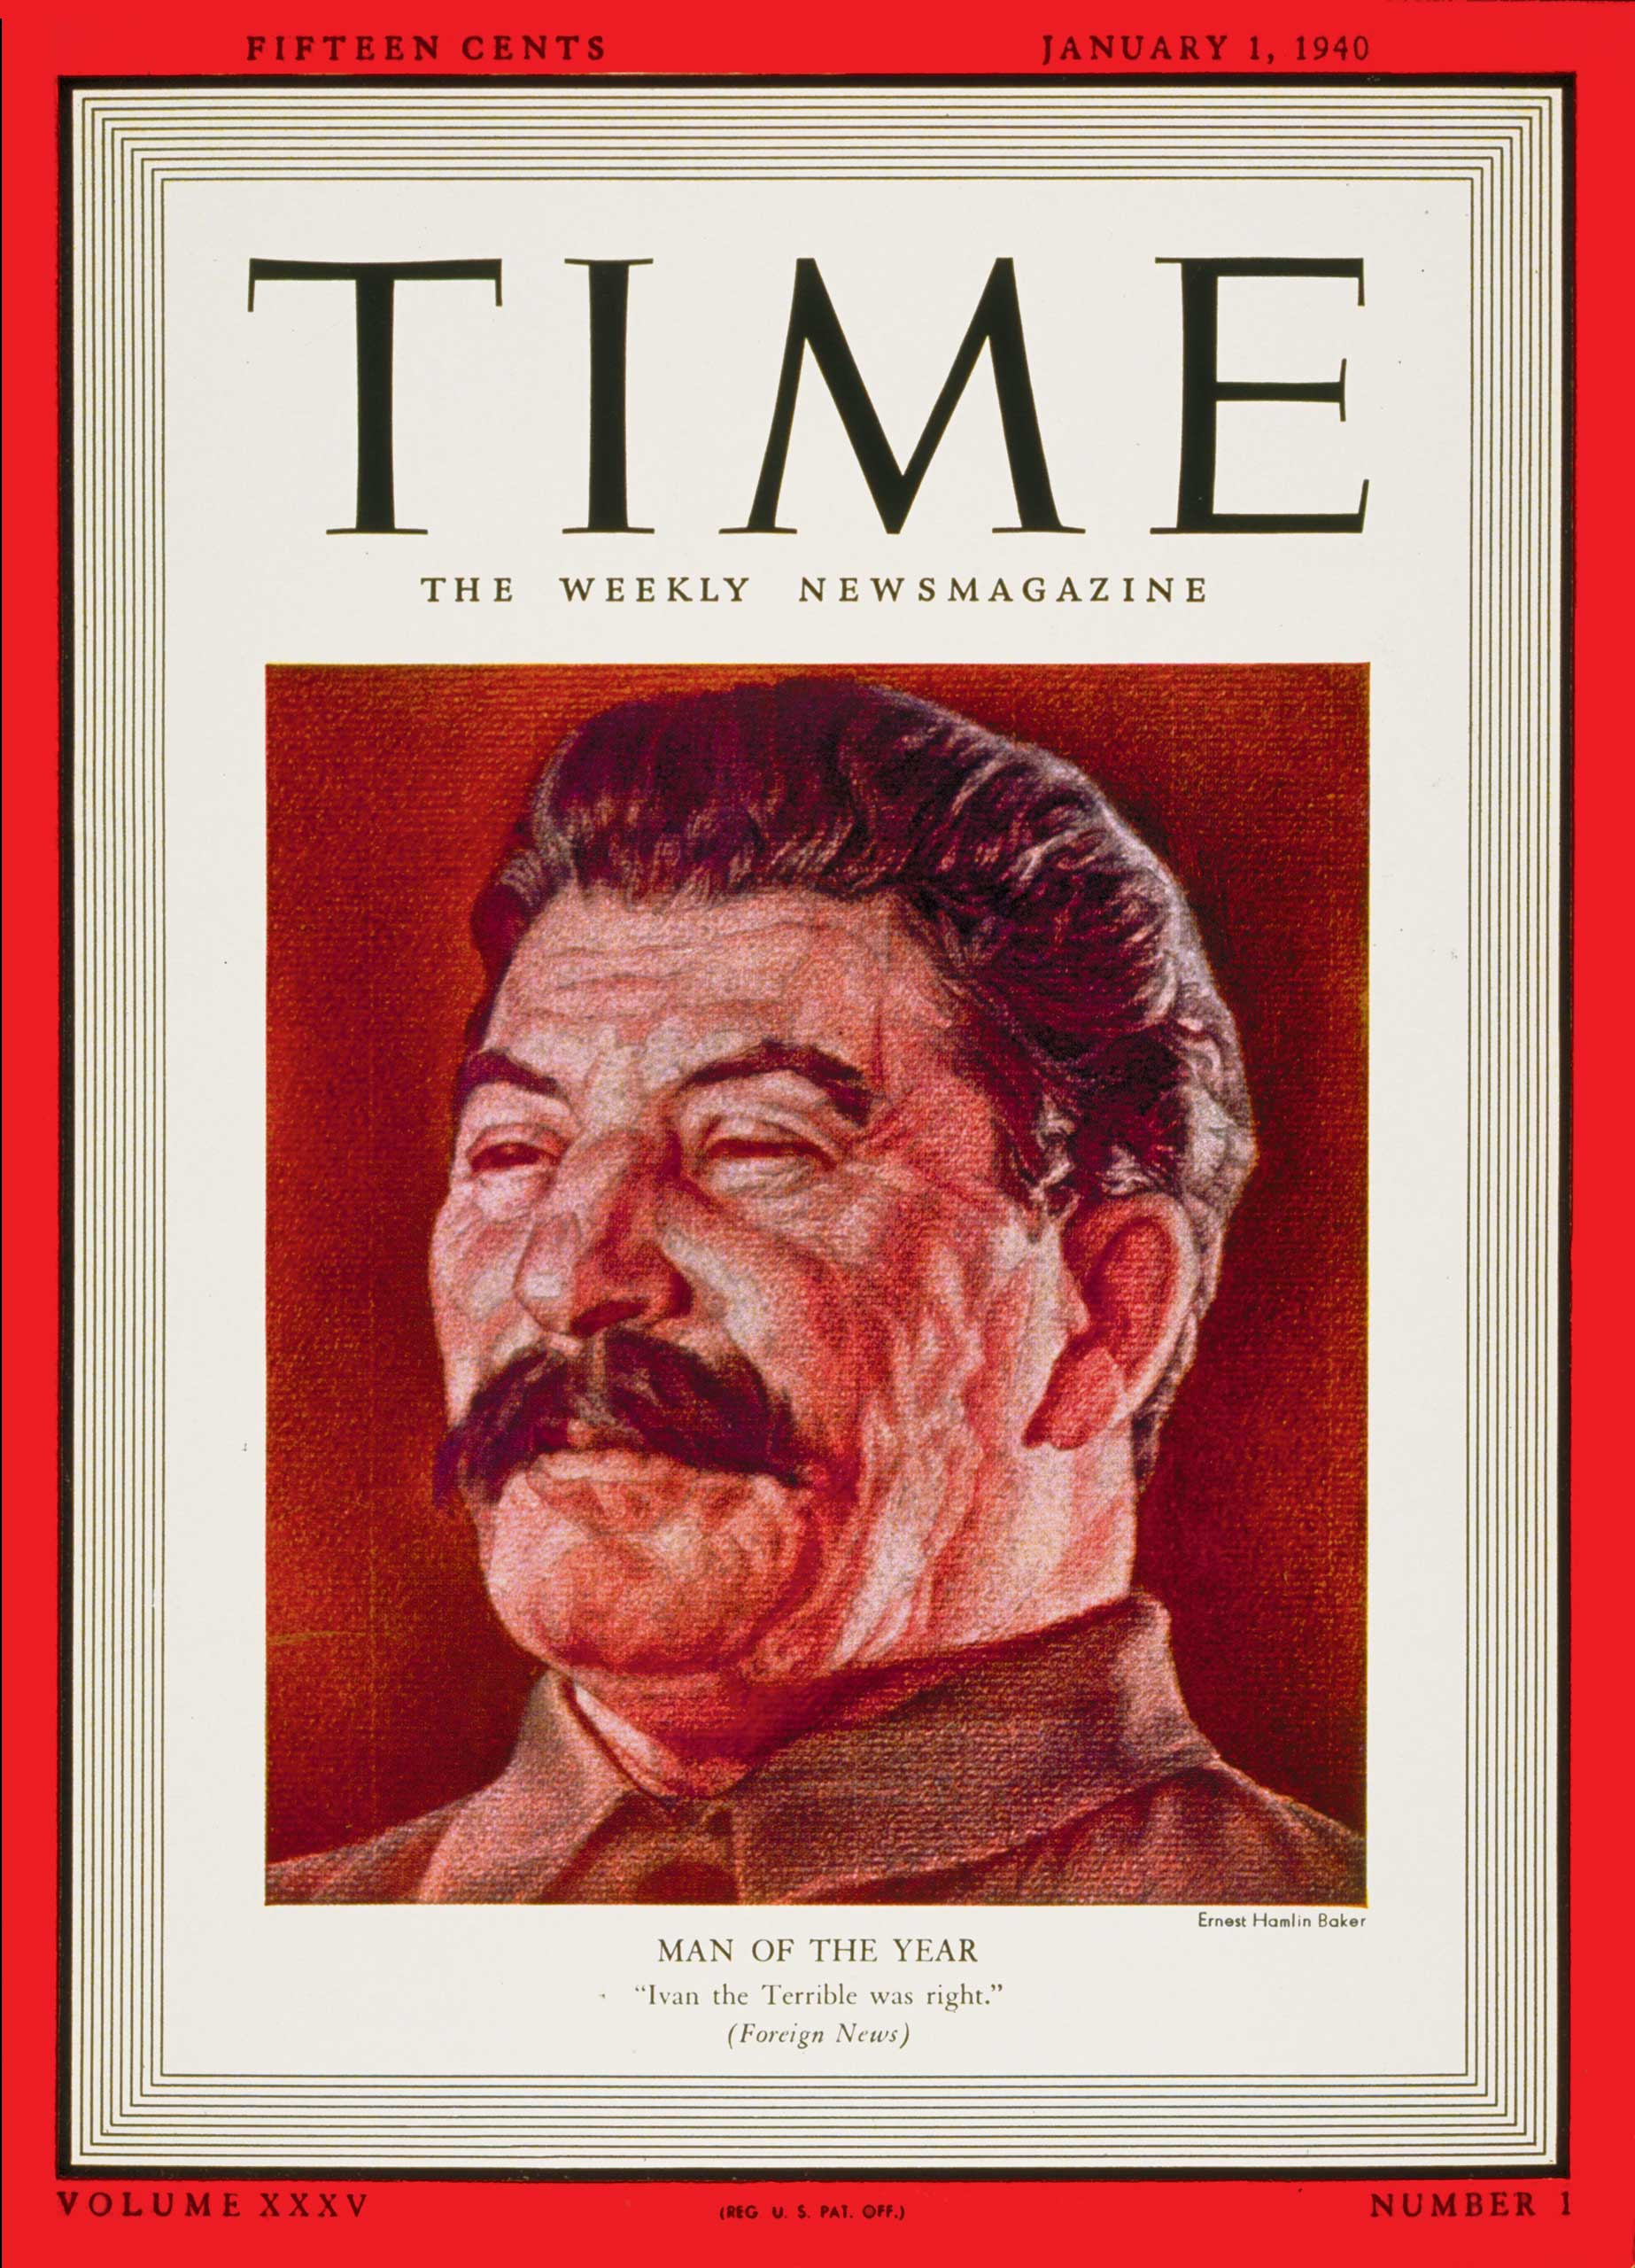 1939: Joseph Stalin